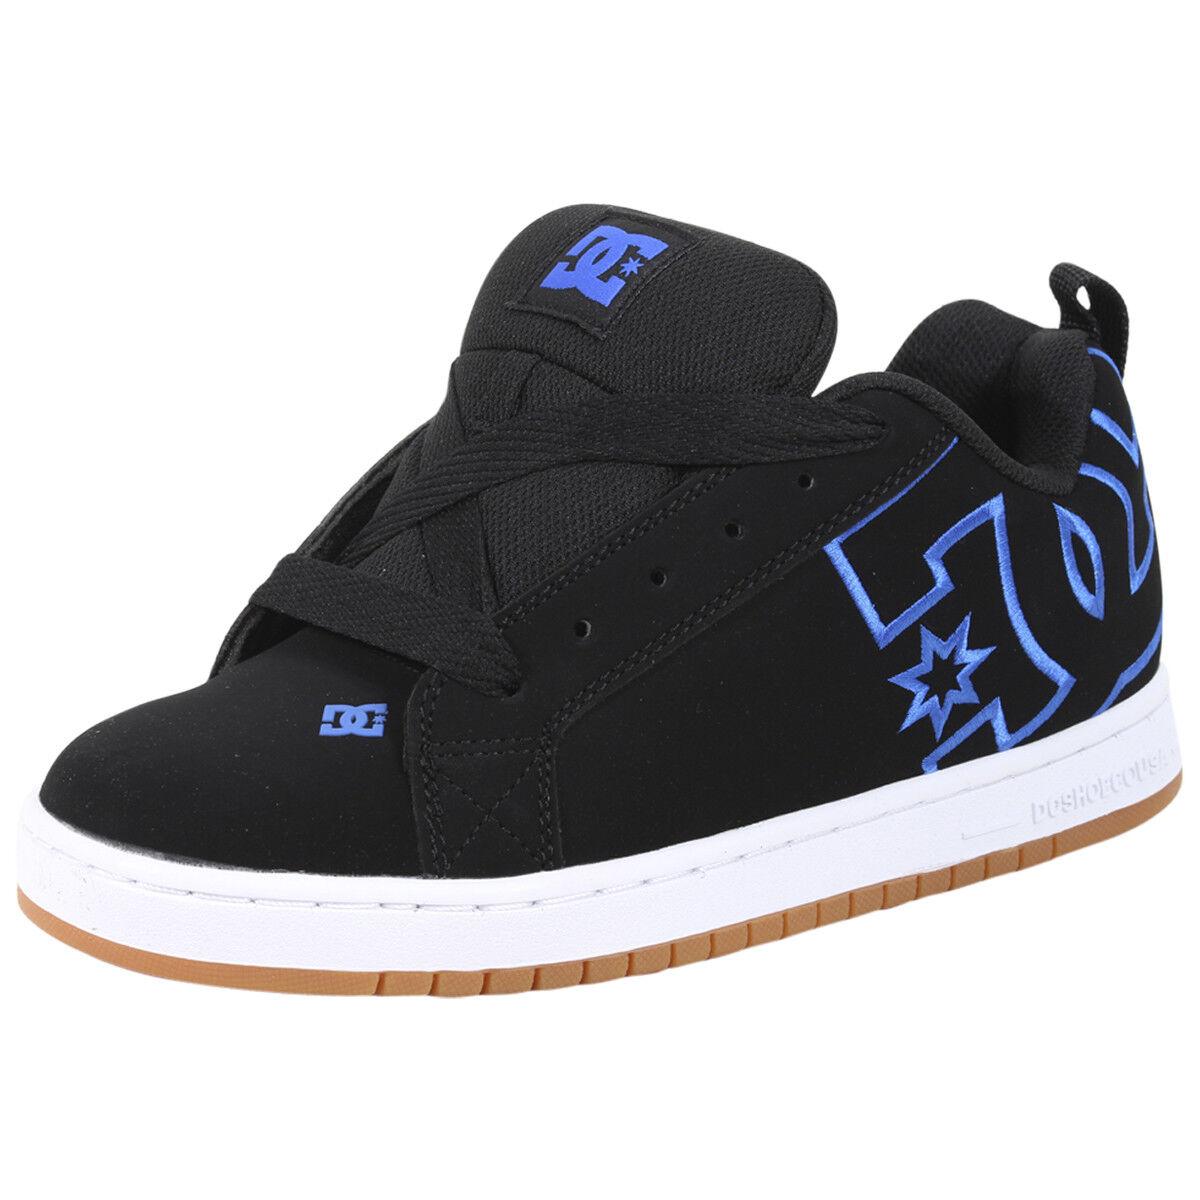 DC scarpe Uomo Court Graffik Skateboarding scarpe da ginnastica ginnastica ginnastica scarpe 5a2f98